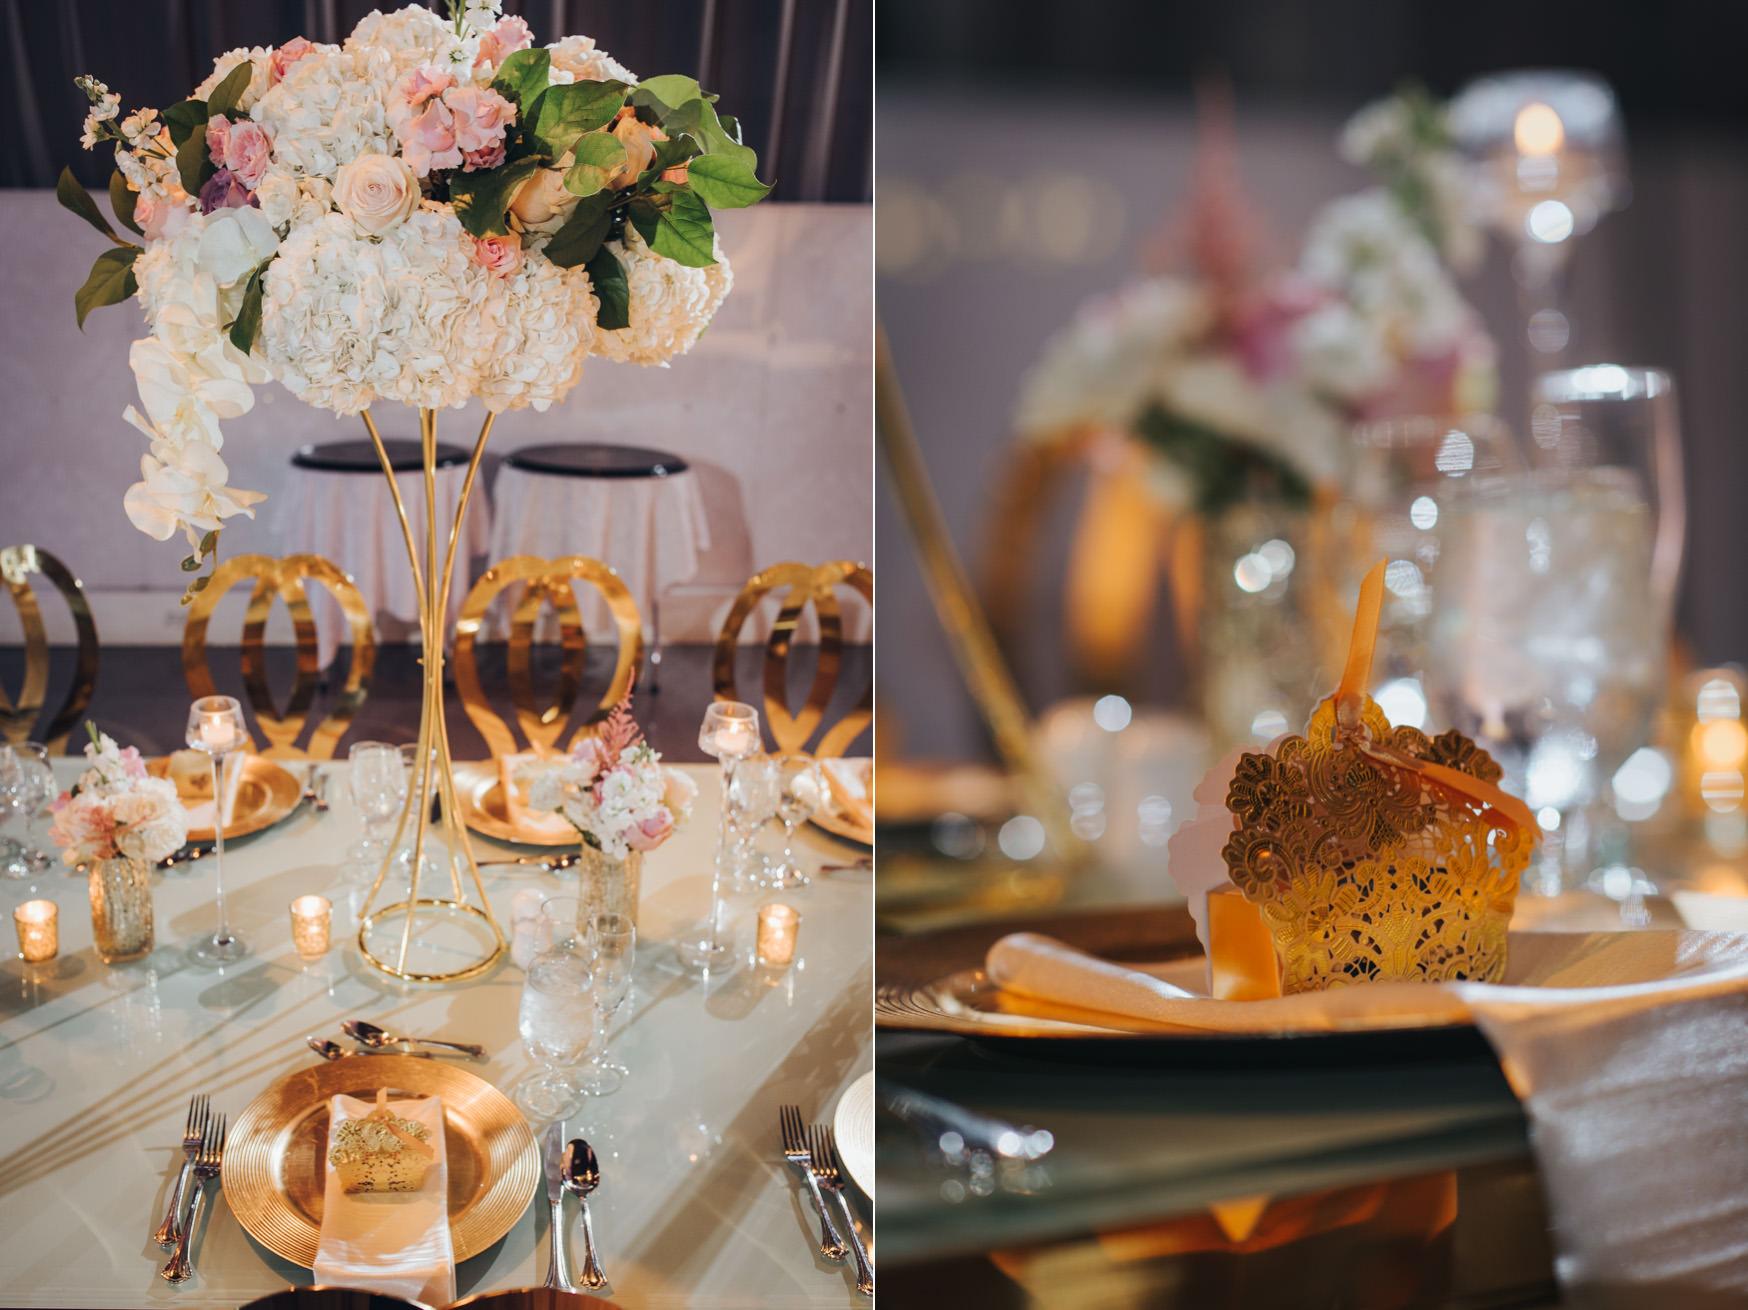 Liberty Grand Artifacts Room Wedding Reception Table Setting